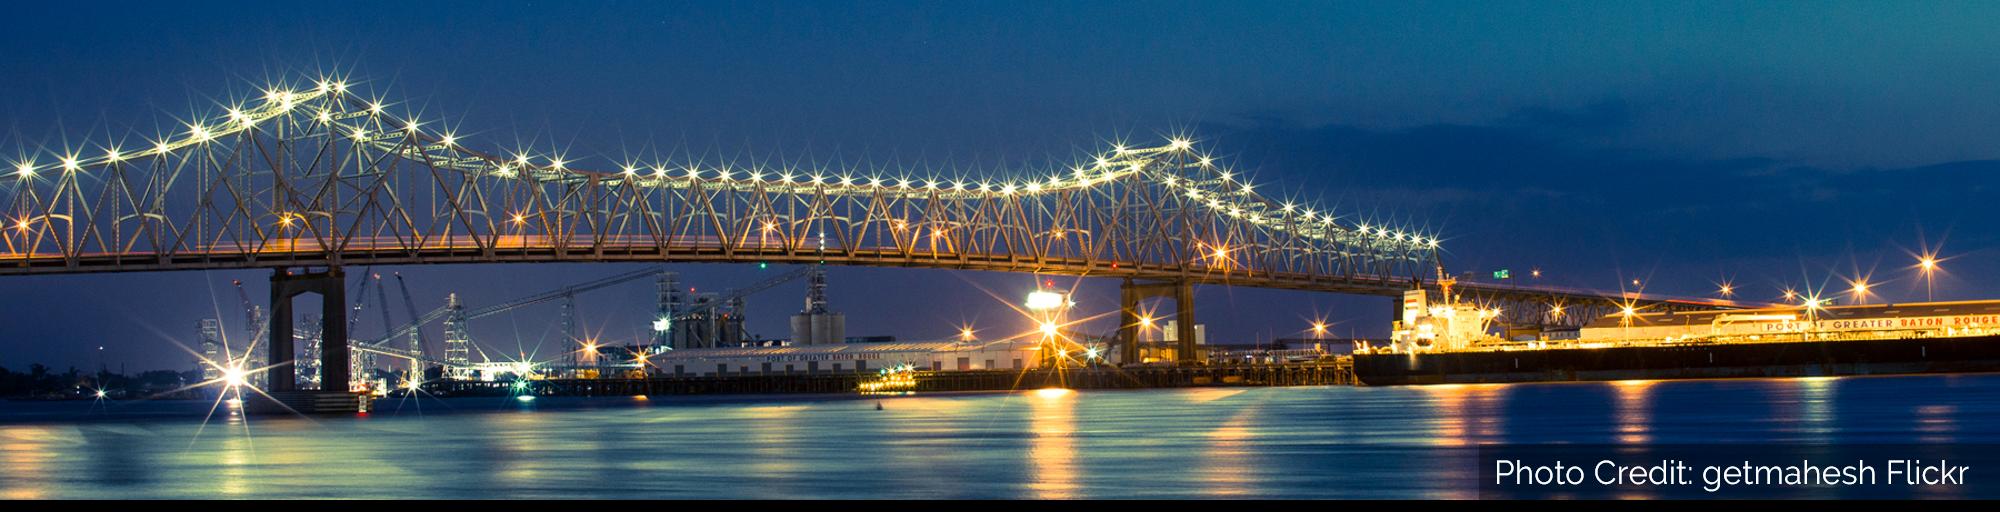 Import One Baton Rouge >> Hvs Hvs Market Pulse Baton Rouge La